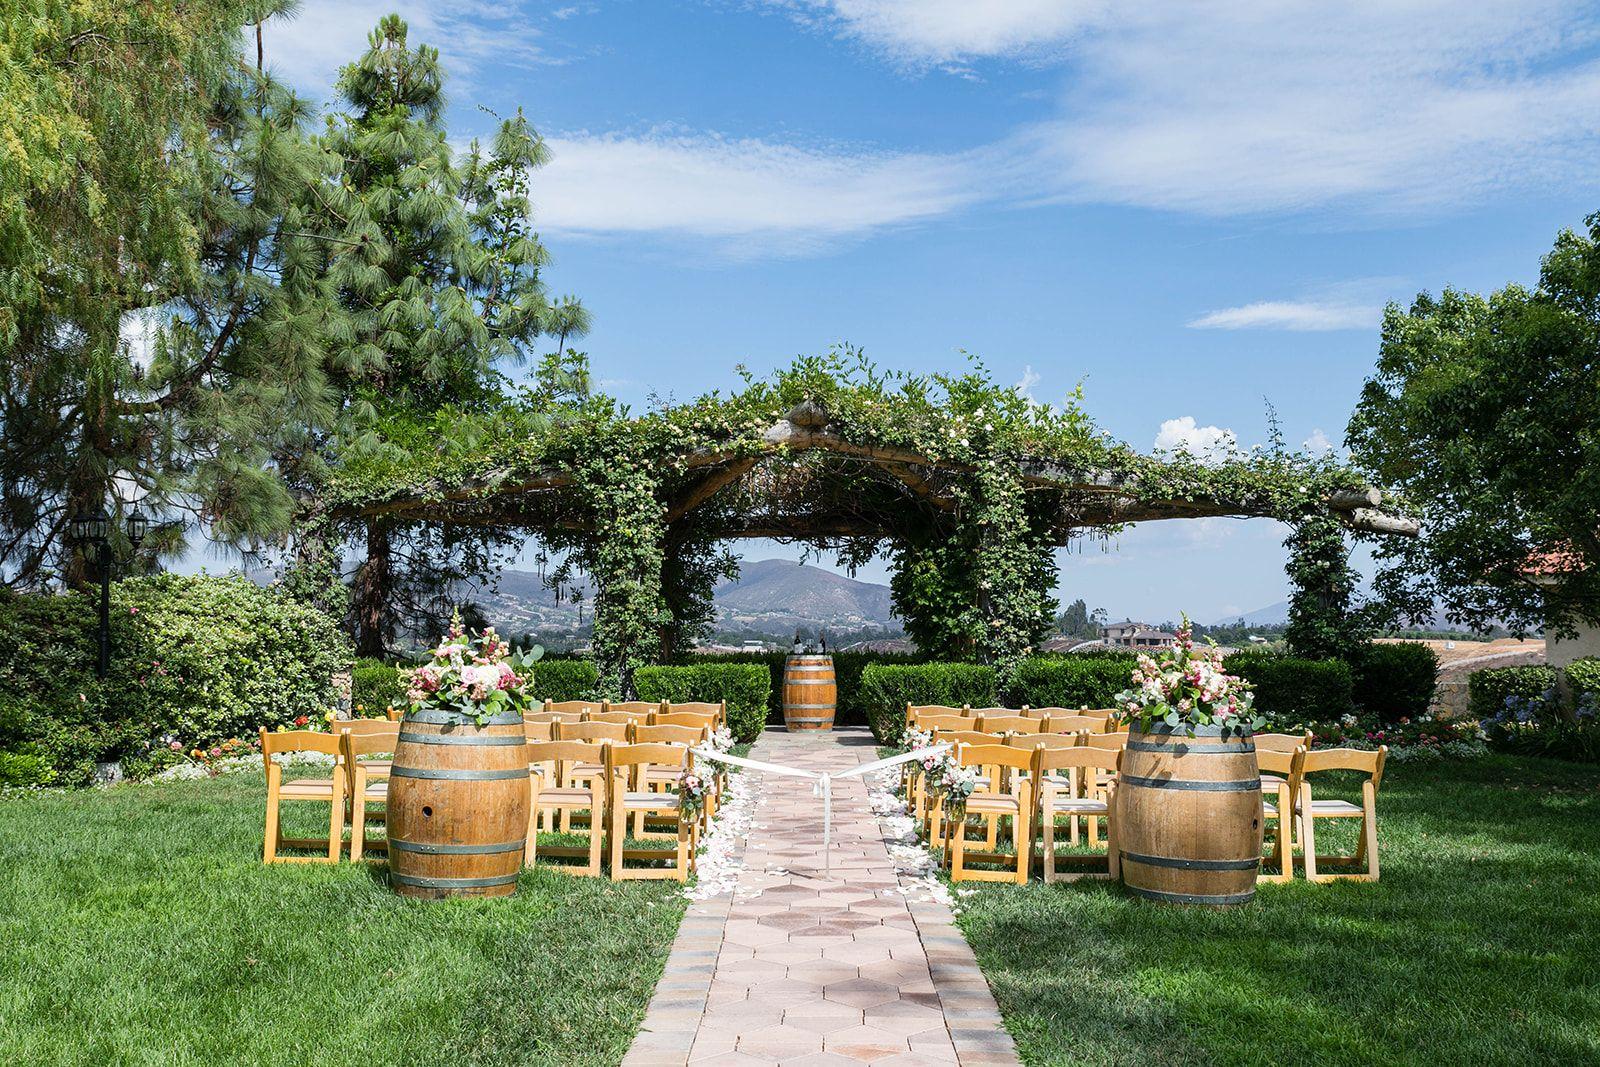 South Coast Winery Wedding Venue in Temecula, CA Leah